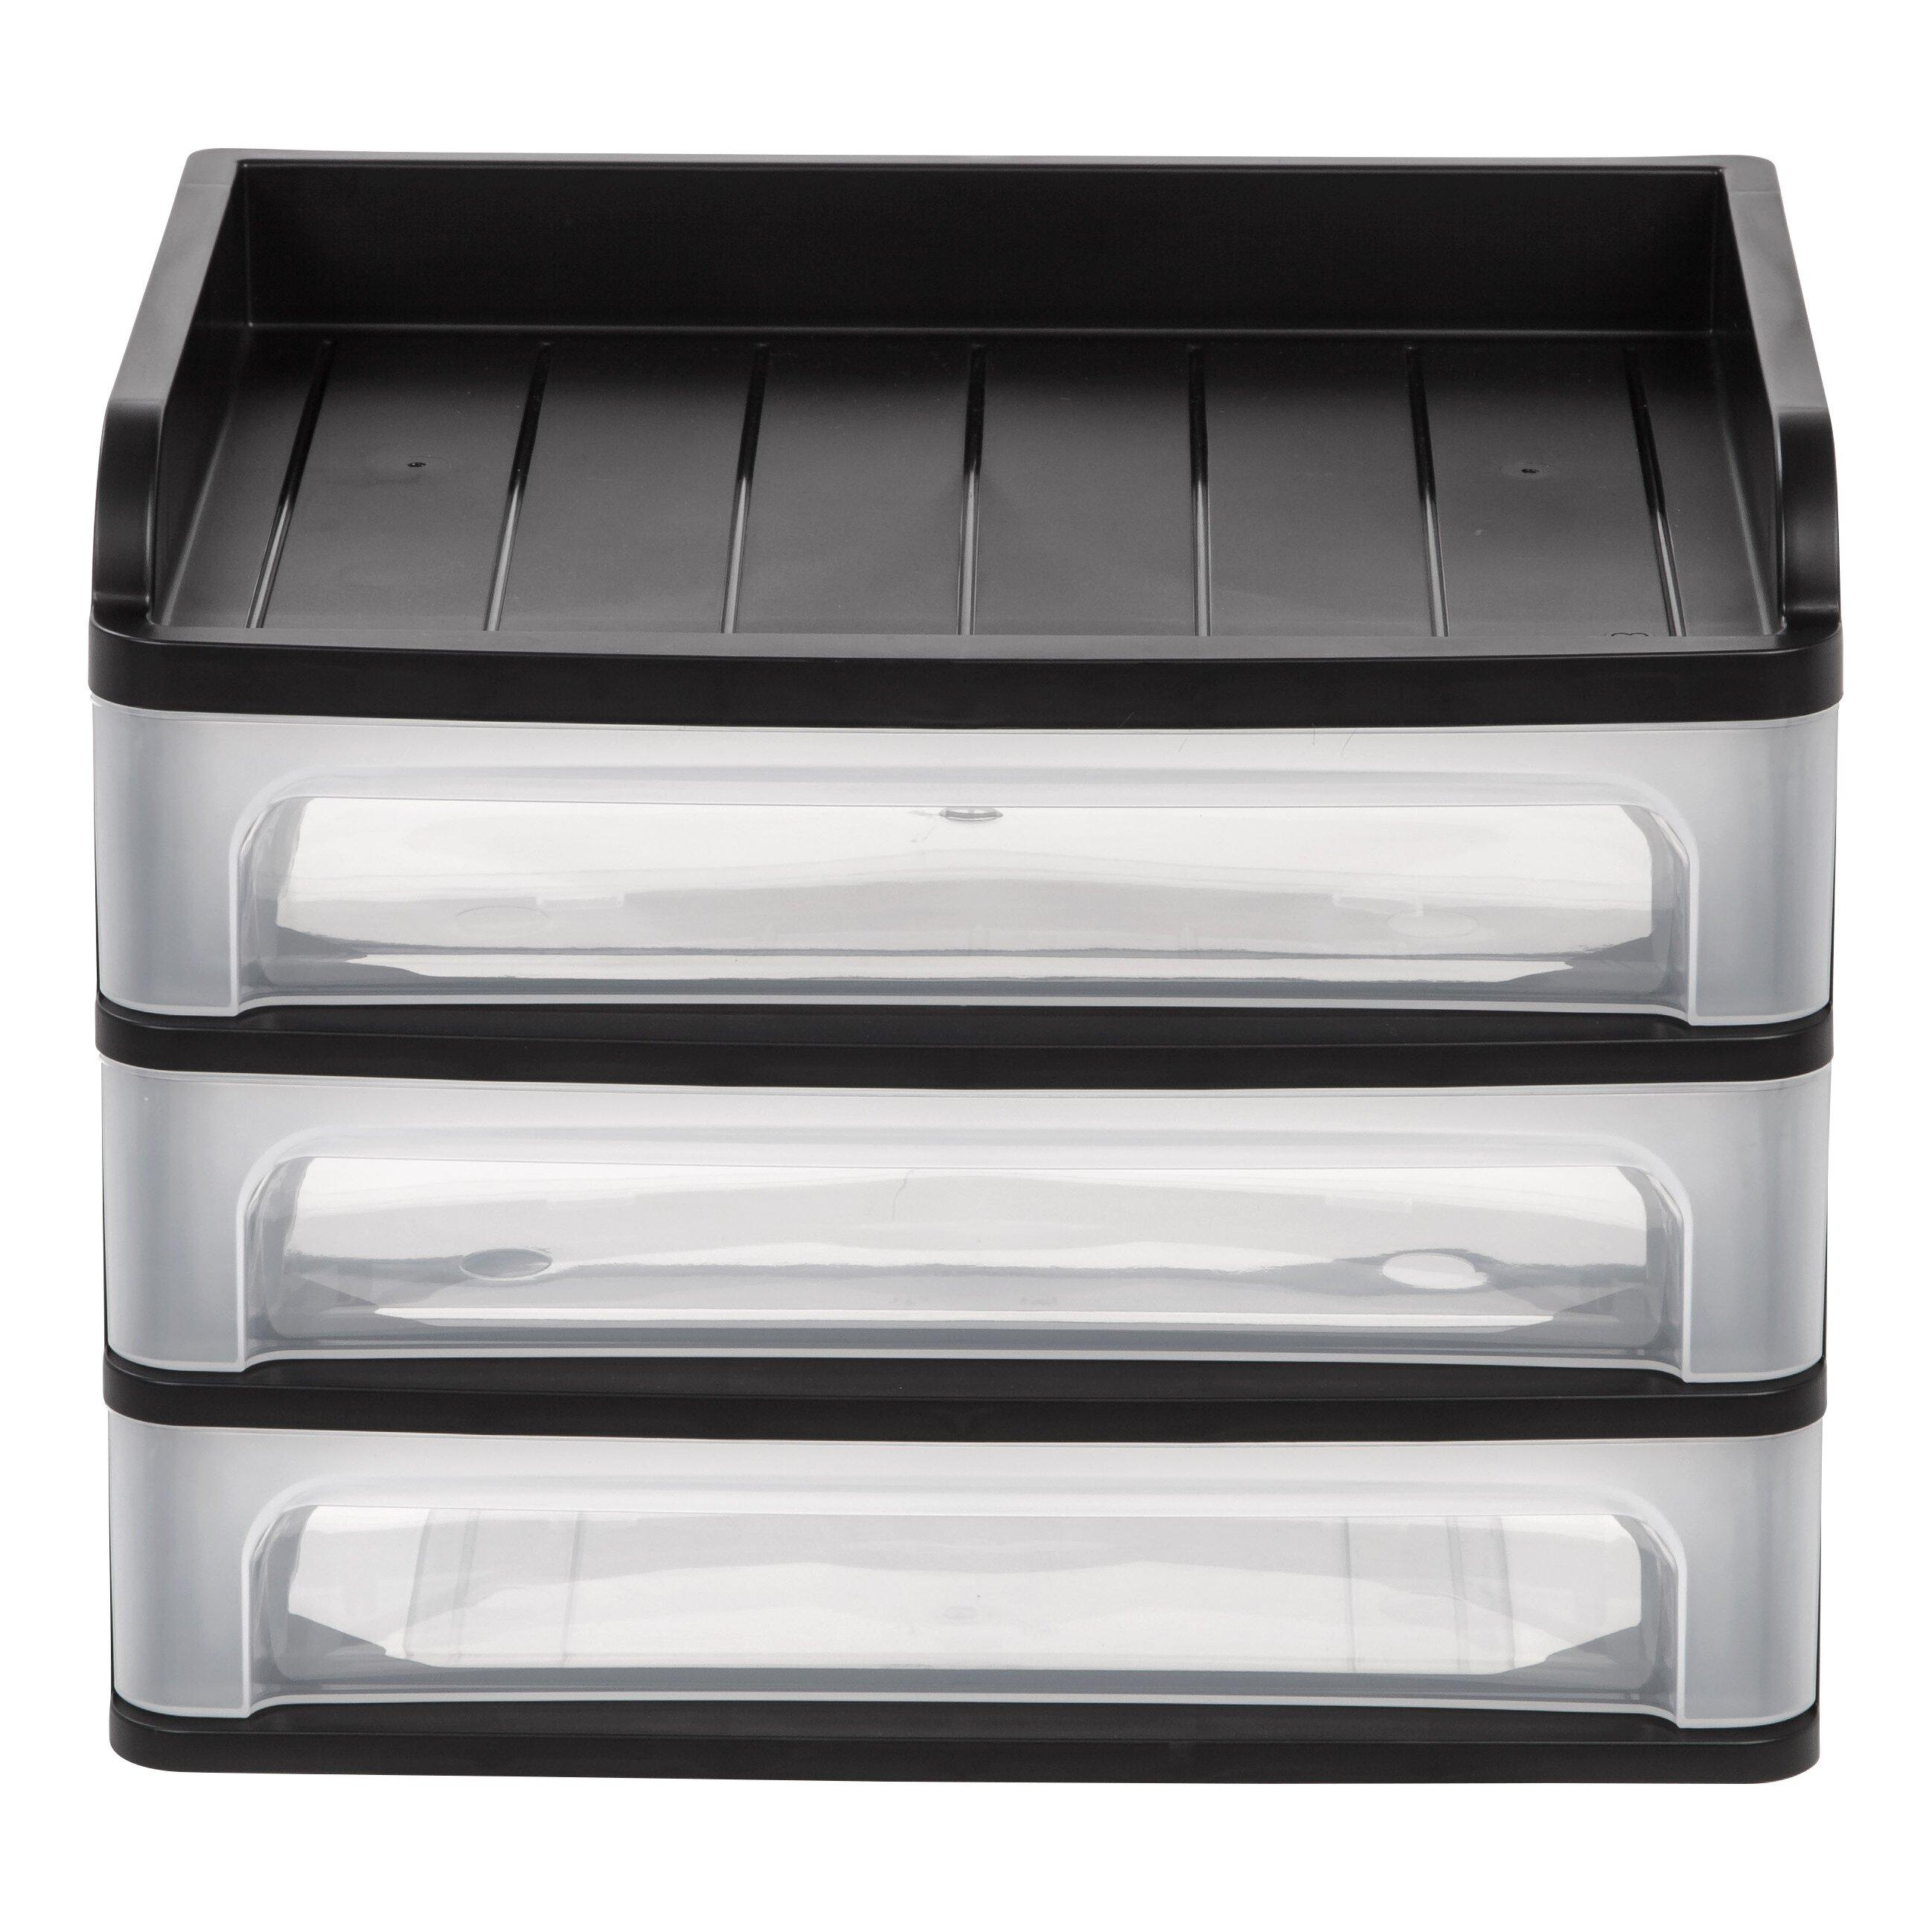 iris 3 drawer desktop organizer reviews wayfair supply. Black Bedroom Furniture Sets. Home Design Ideas